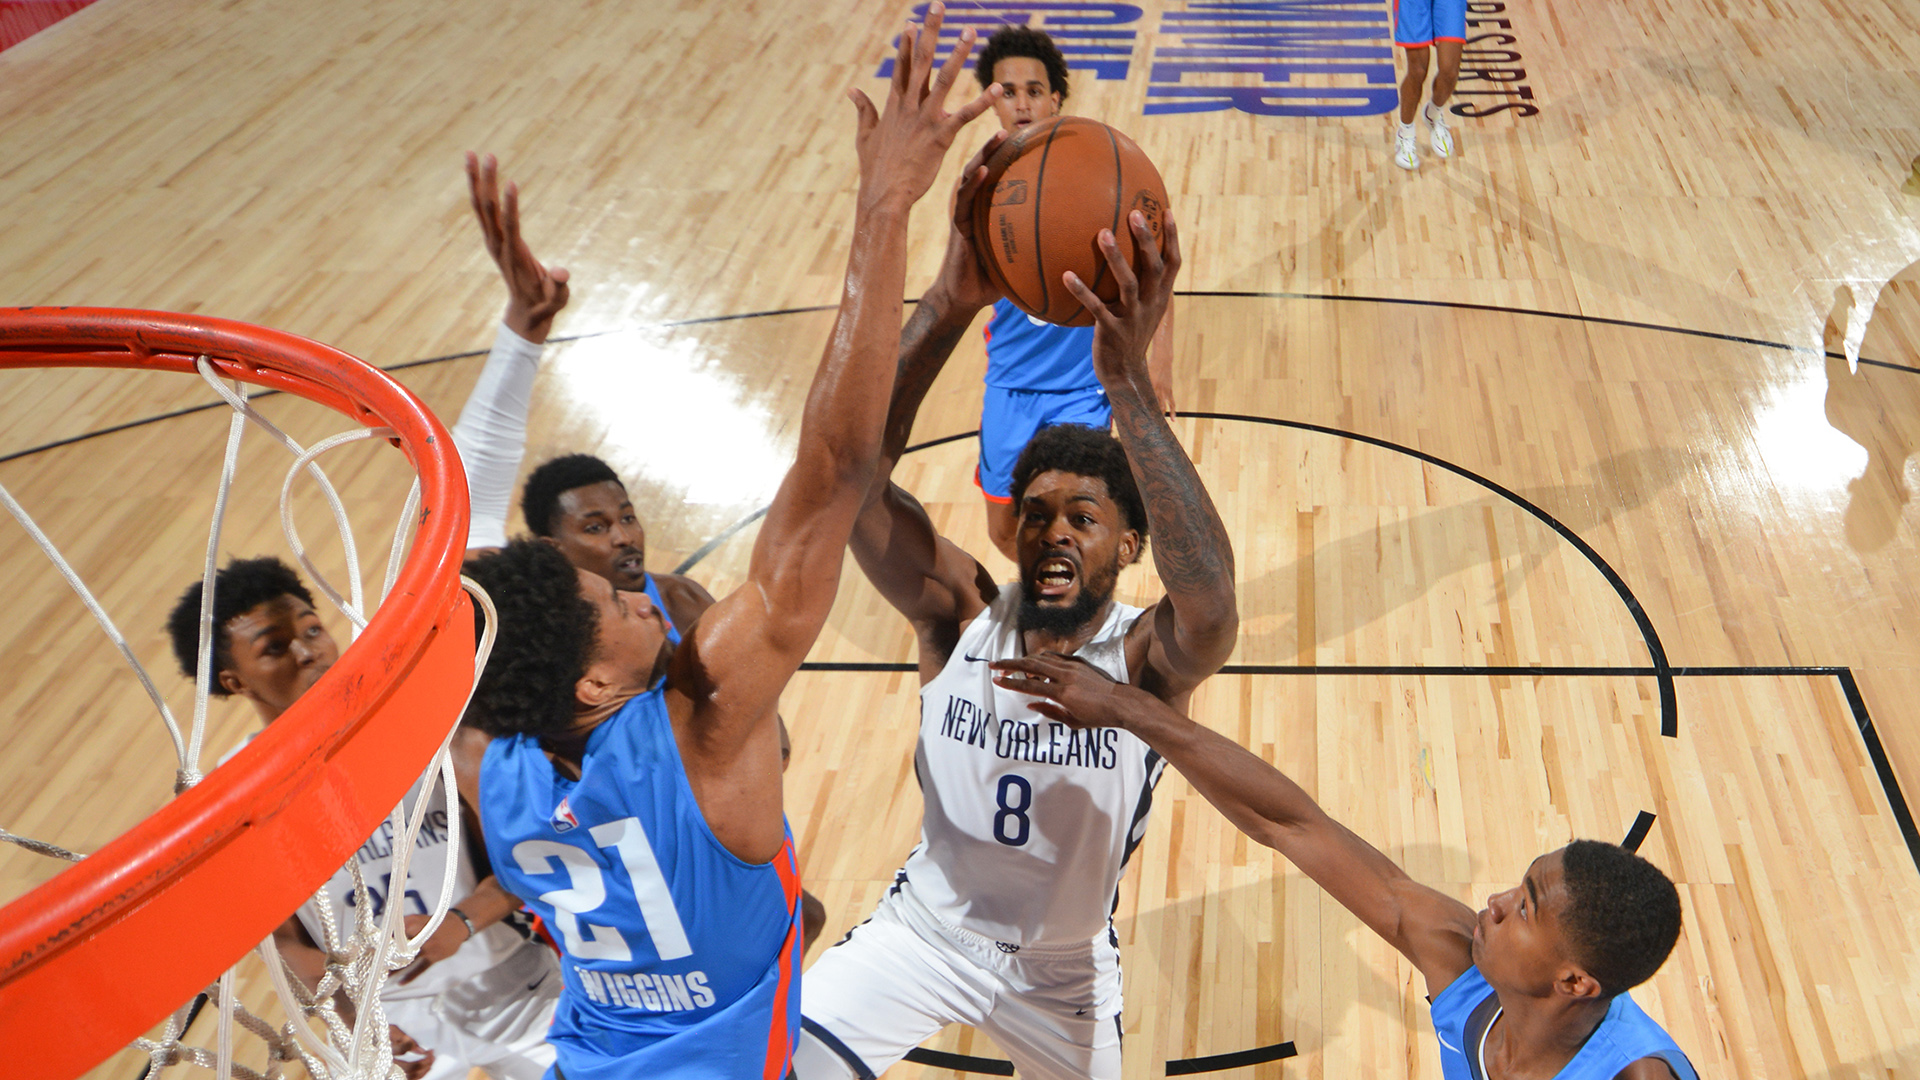 Las Vegas Summer League: Naji Marshall powers Pelicans over Thunder